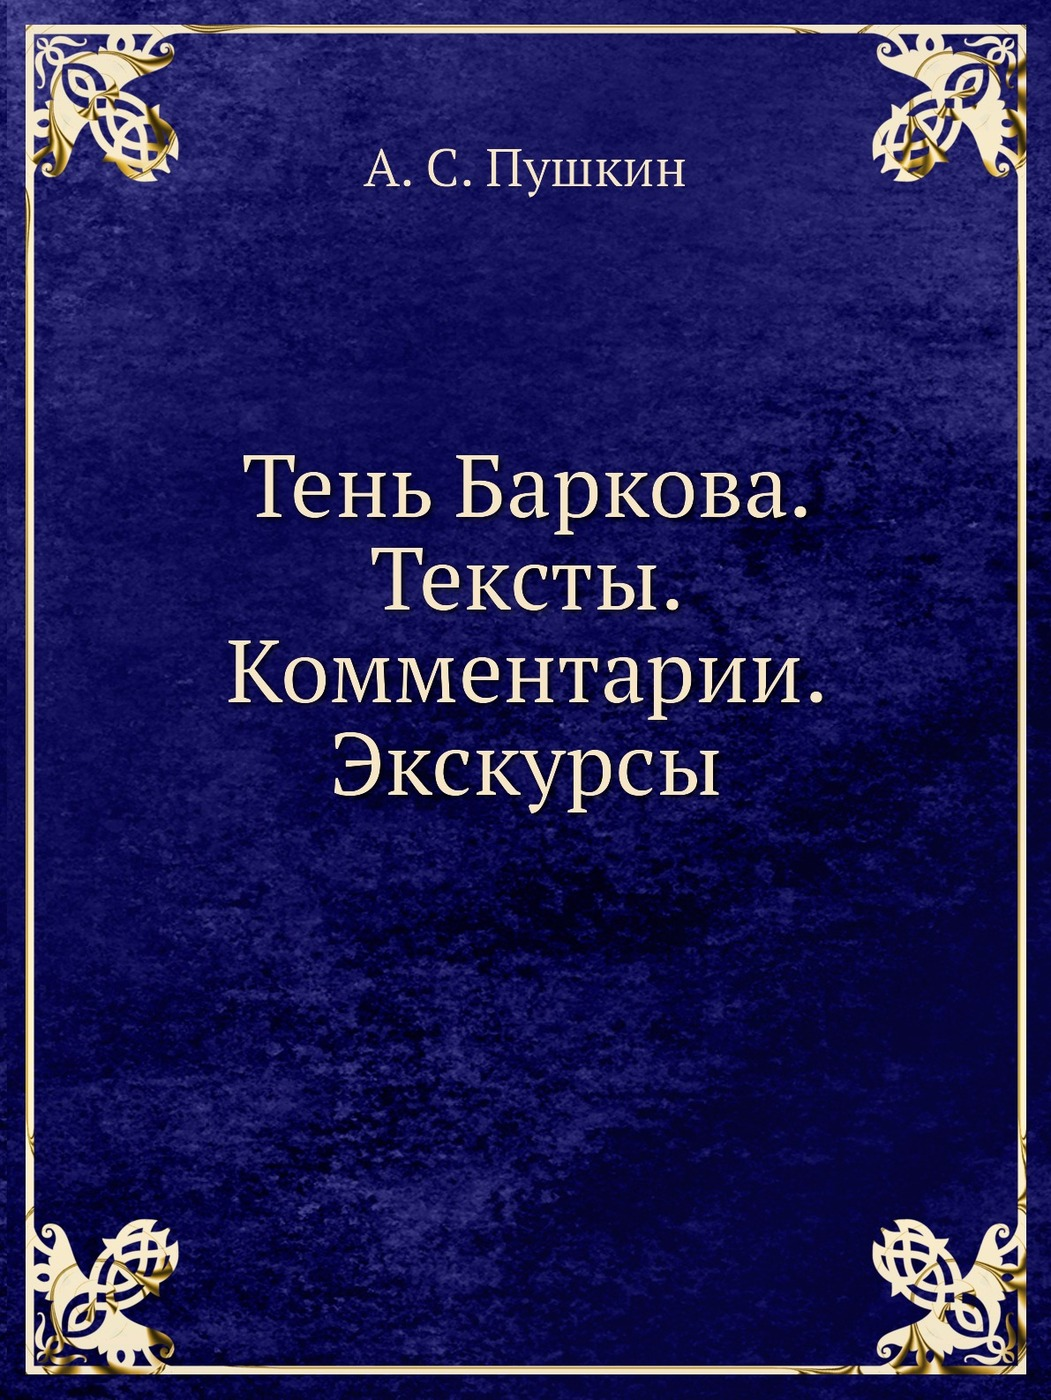 А. С. Пушкин Тень Баркова. Тексты. Комментарии. Экскурсы